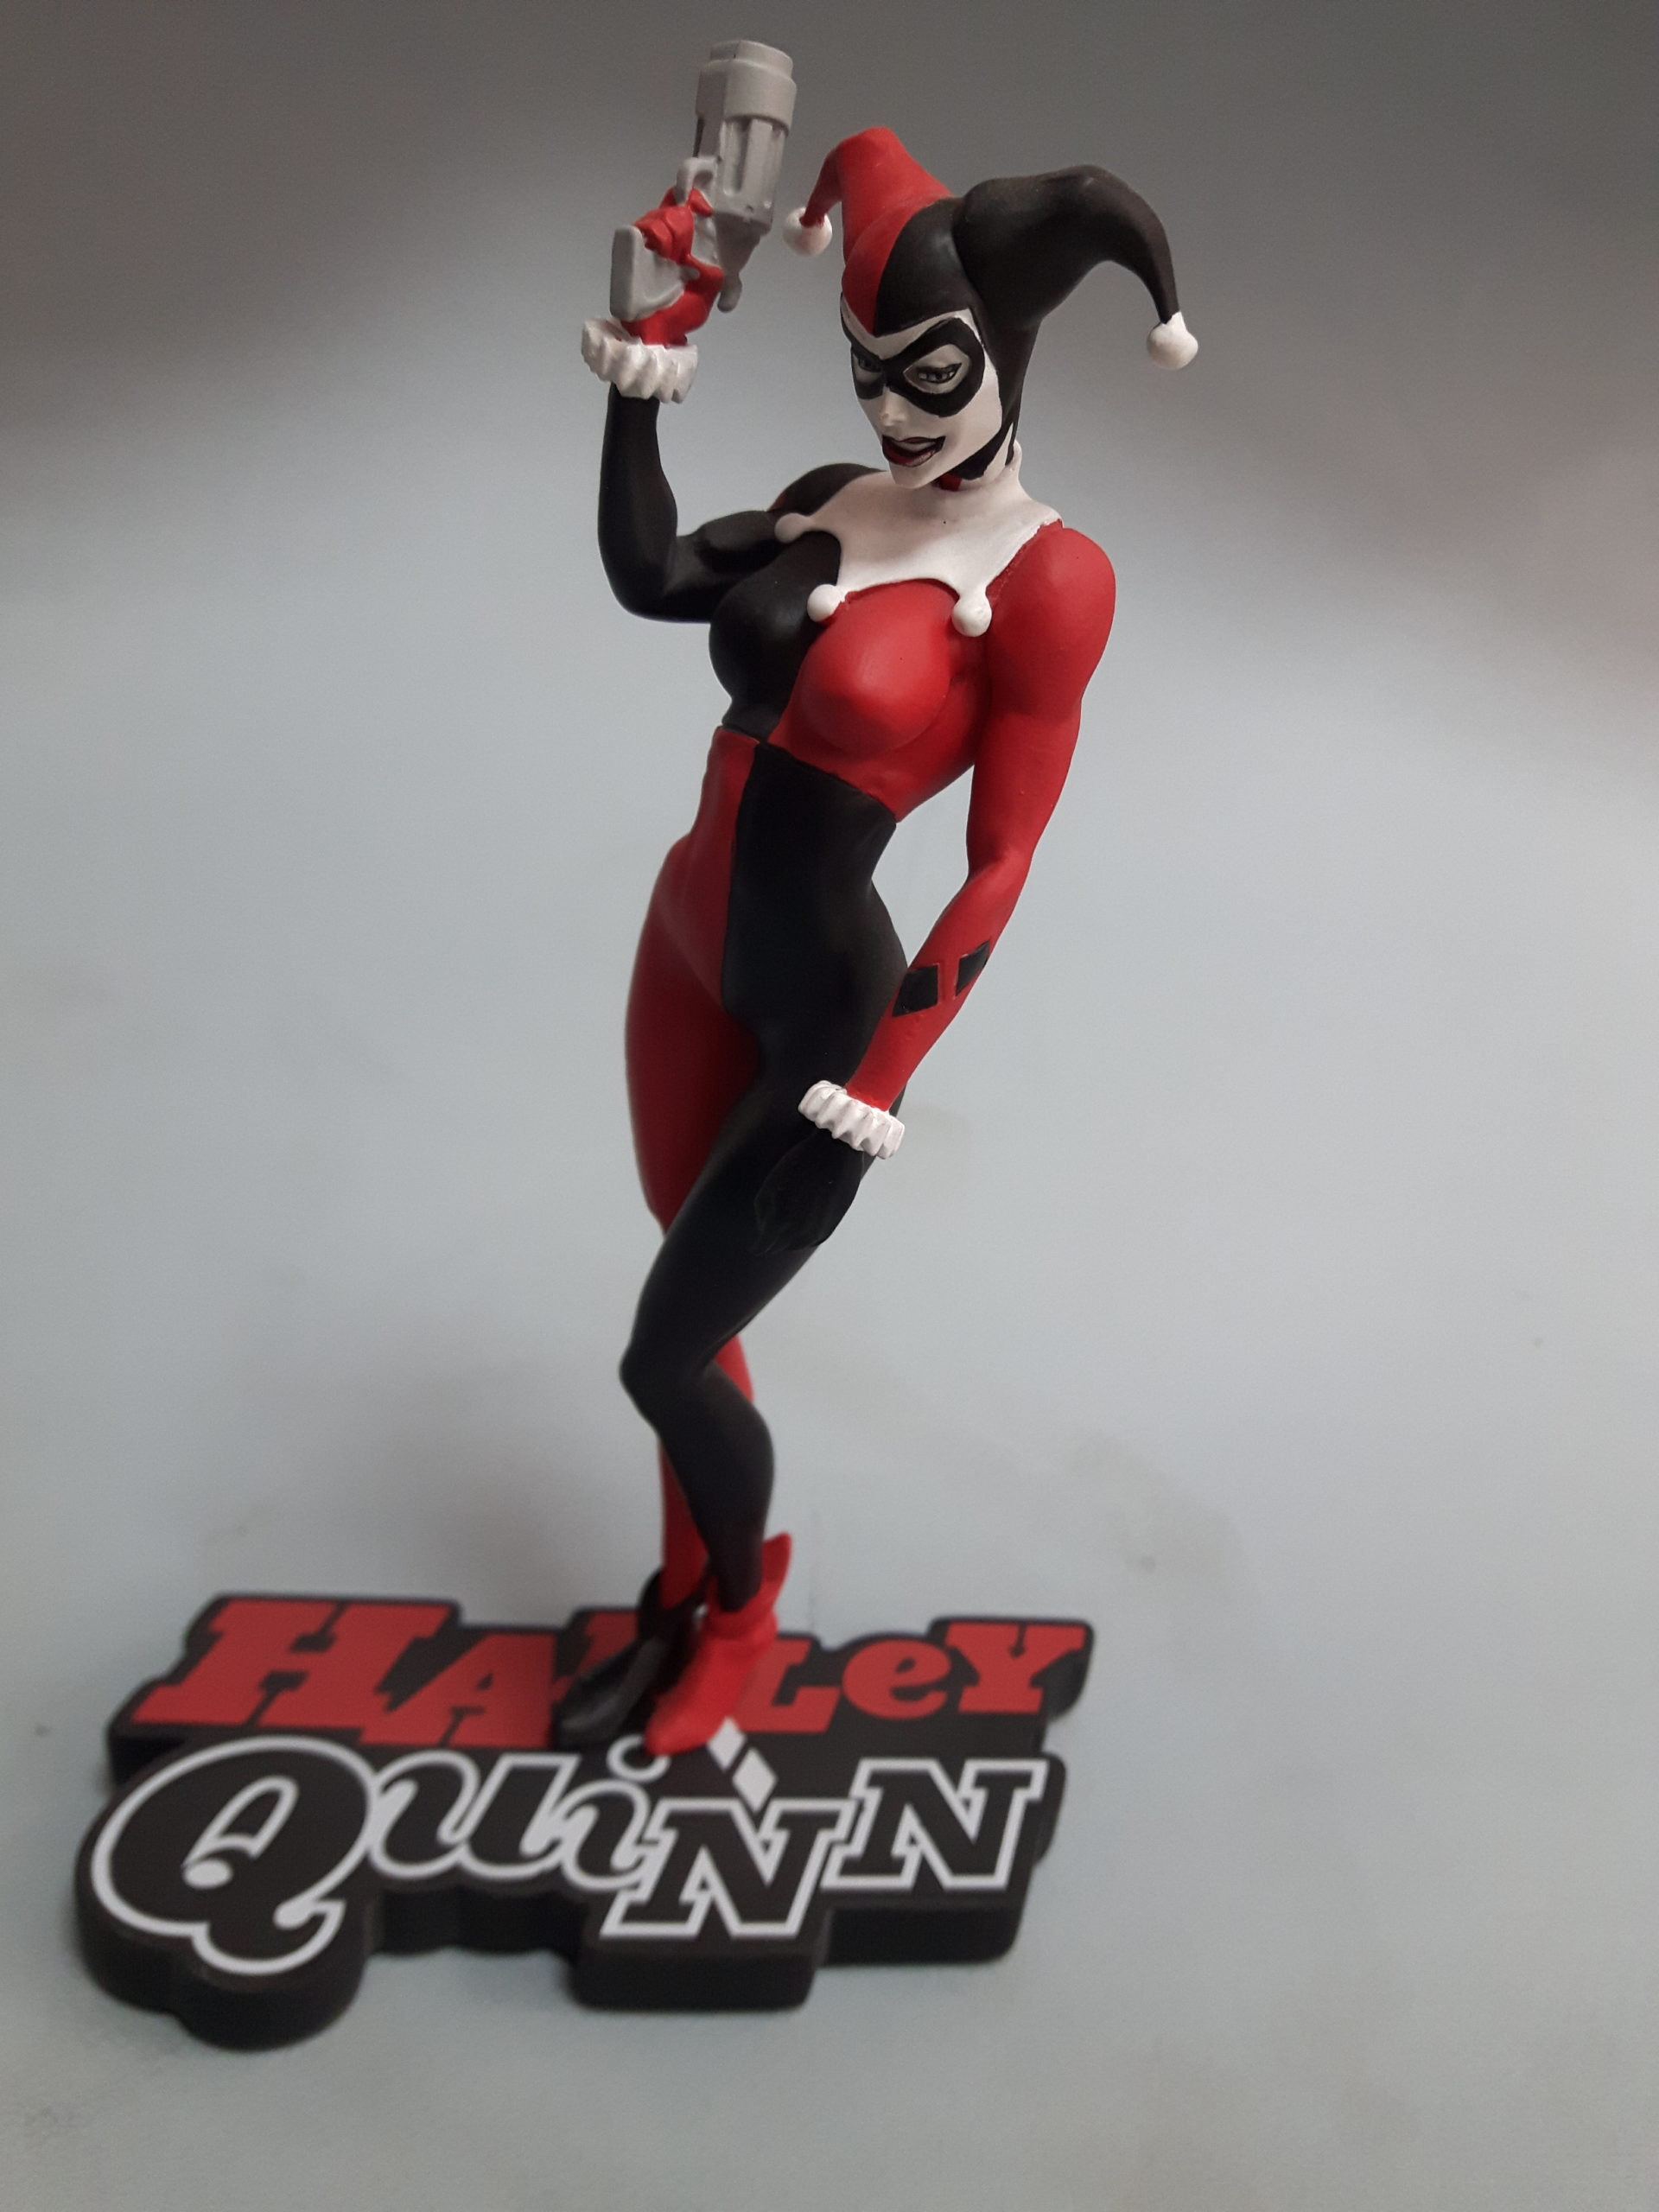 DC Comics Harley Quinn Red White & Black Statue